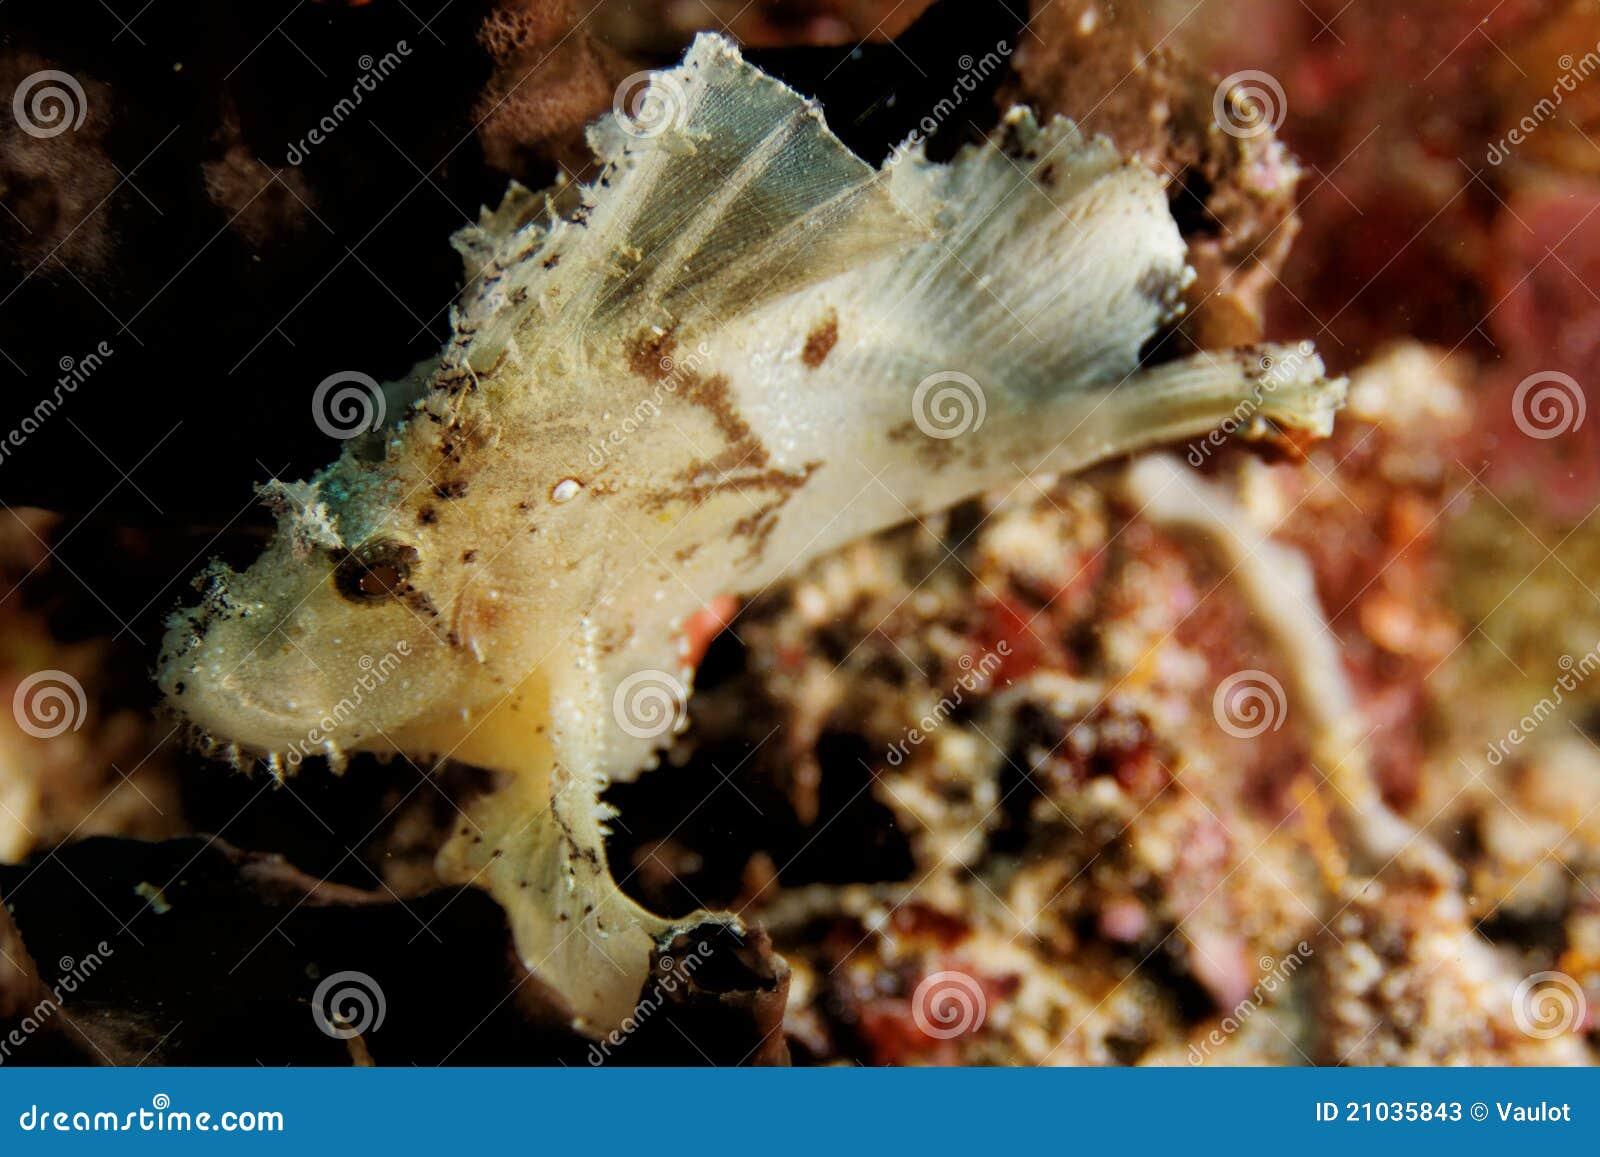 Teanianotius triacanthus - Liść skorpionu ryba